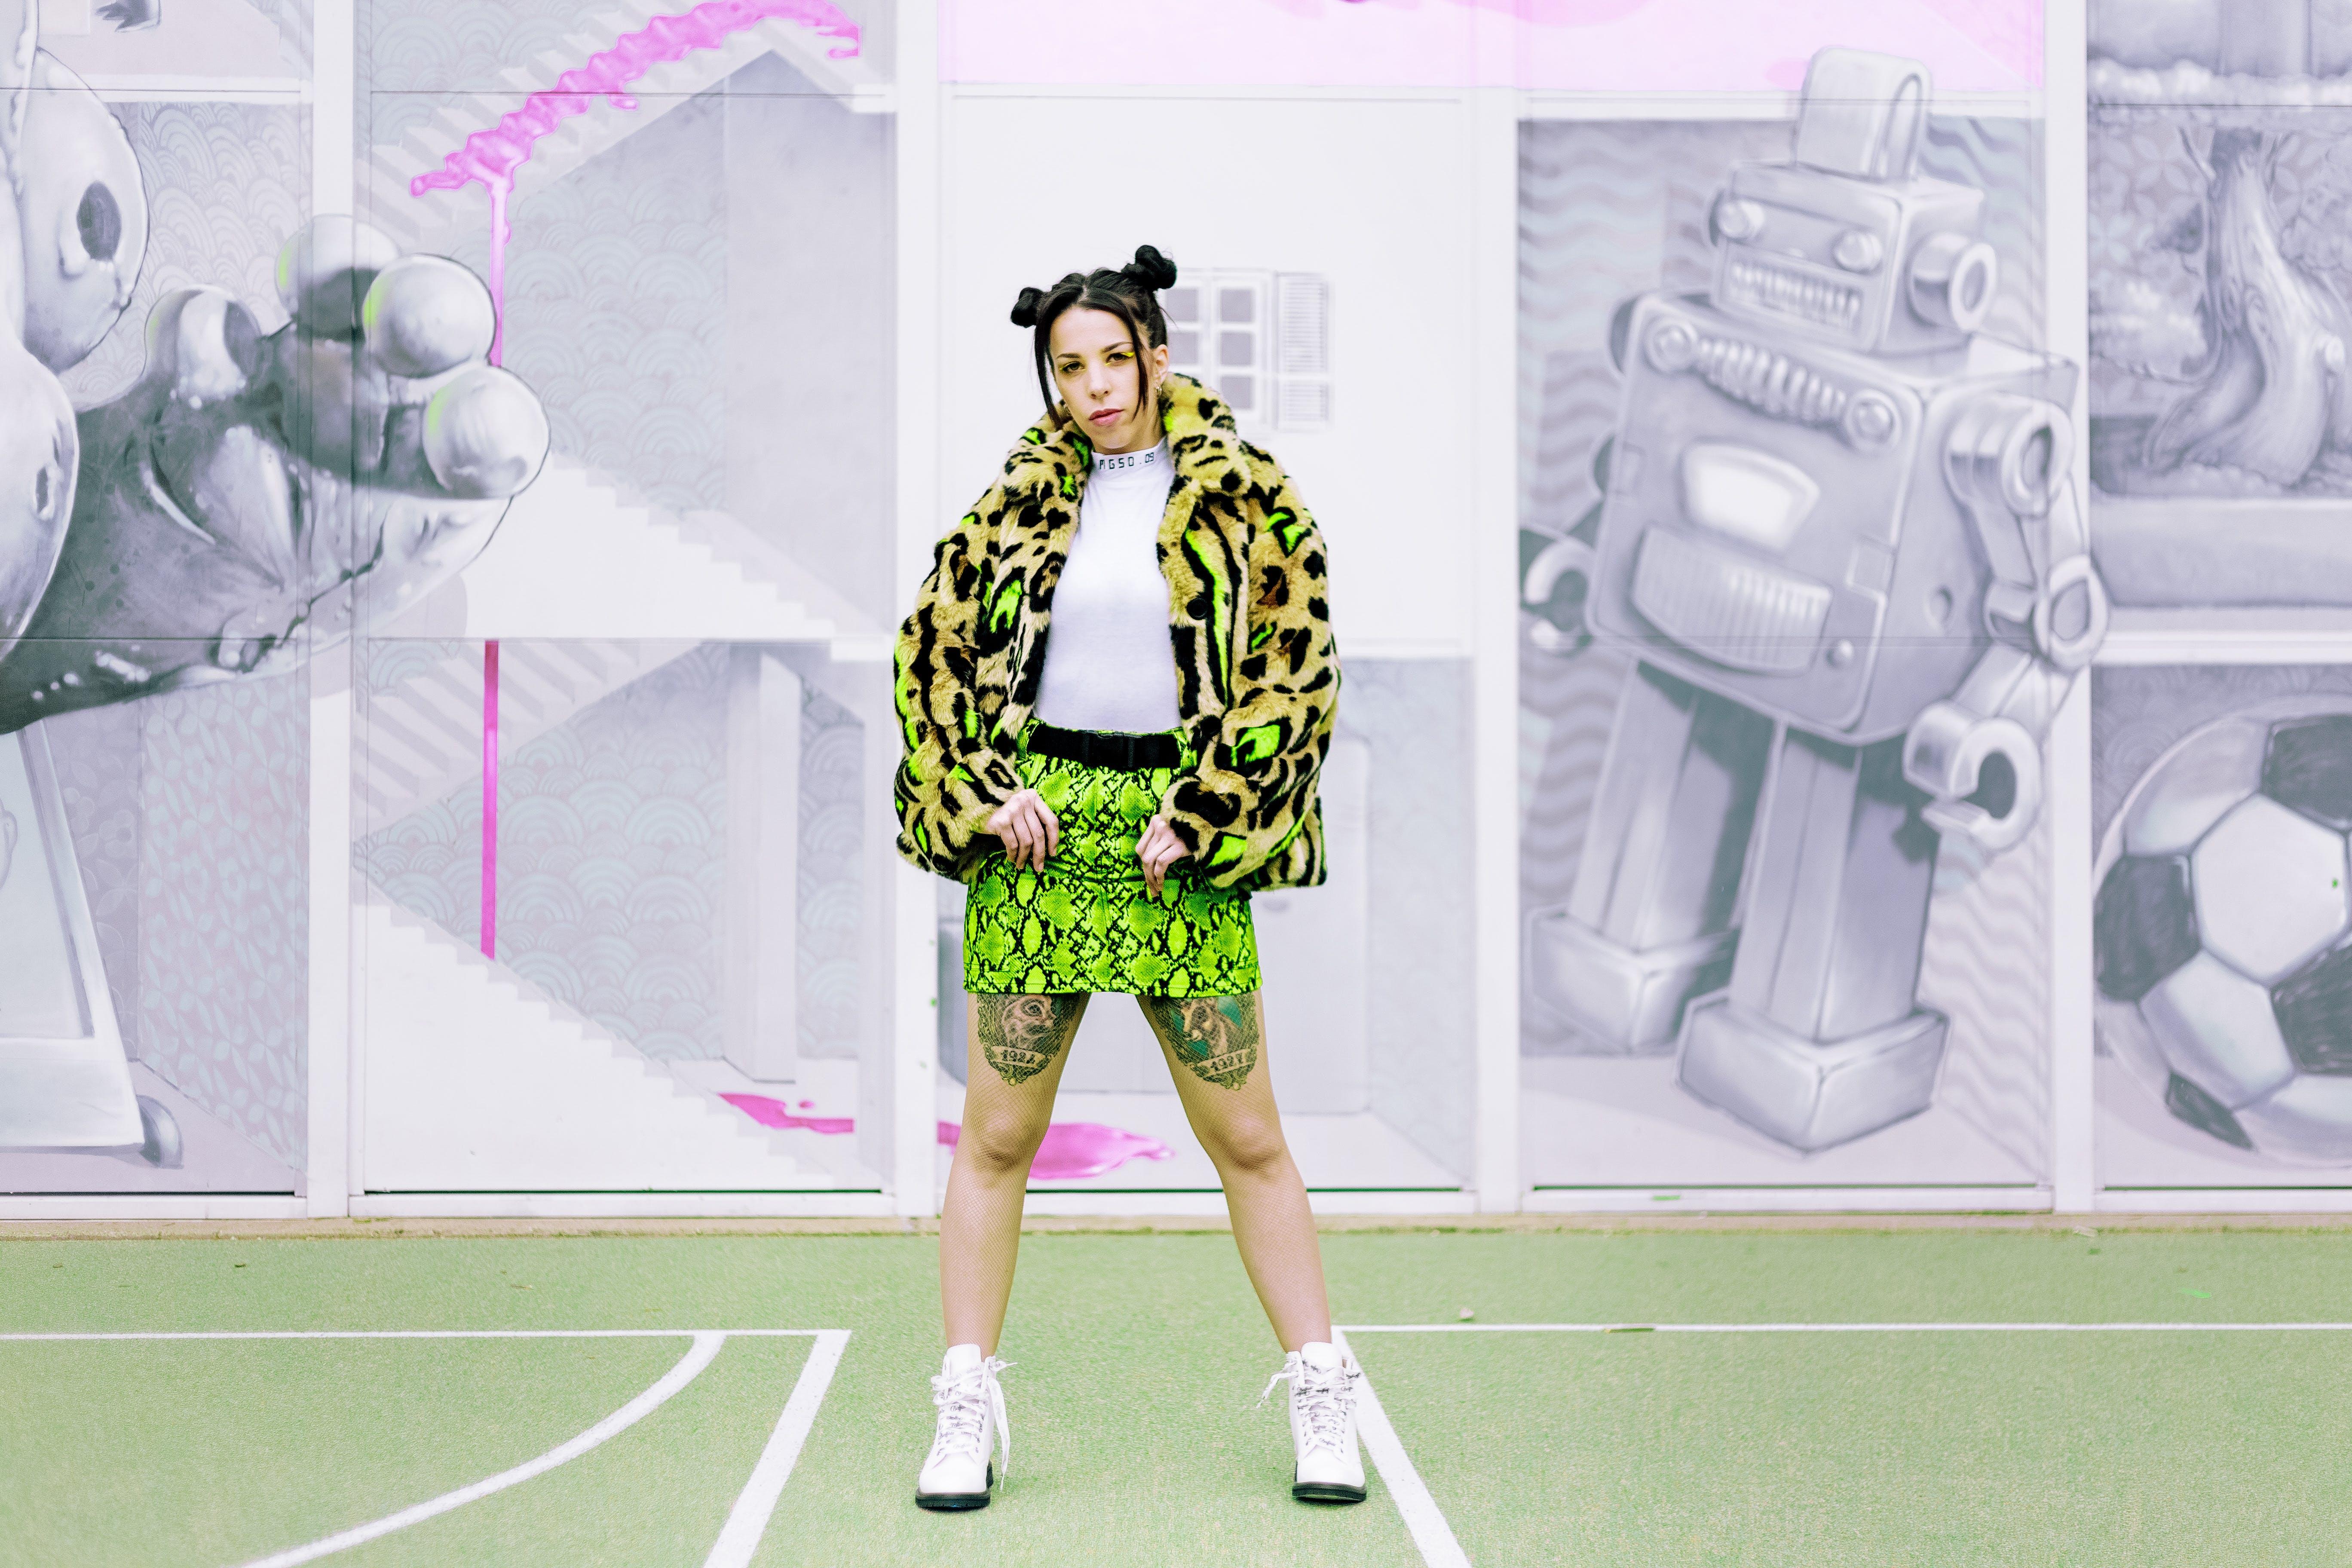 Woman Wearing Coat With Green Mini Skirt